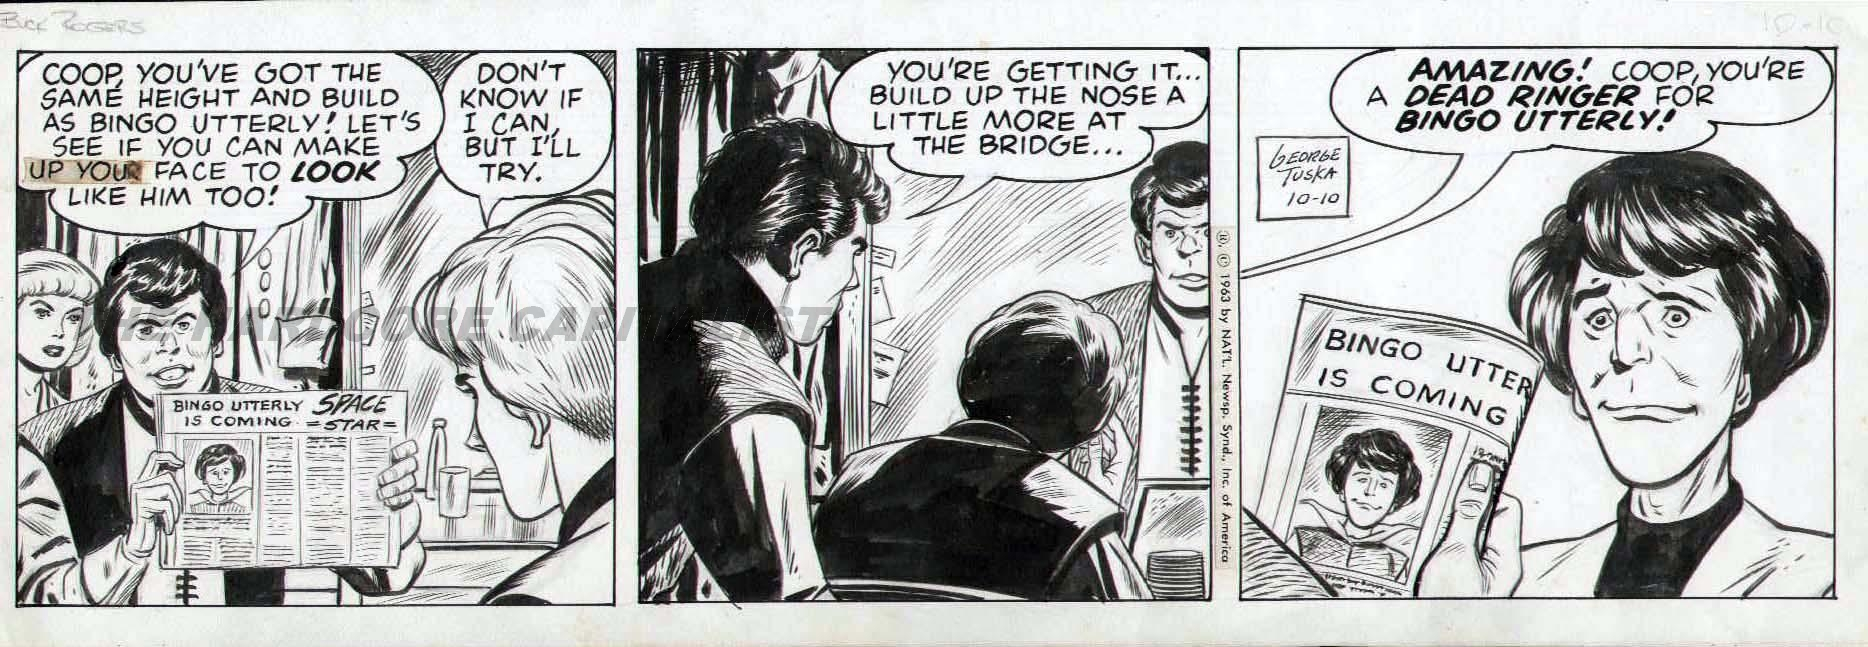 George the comic strip